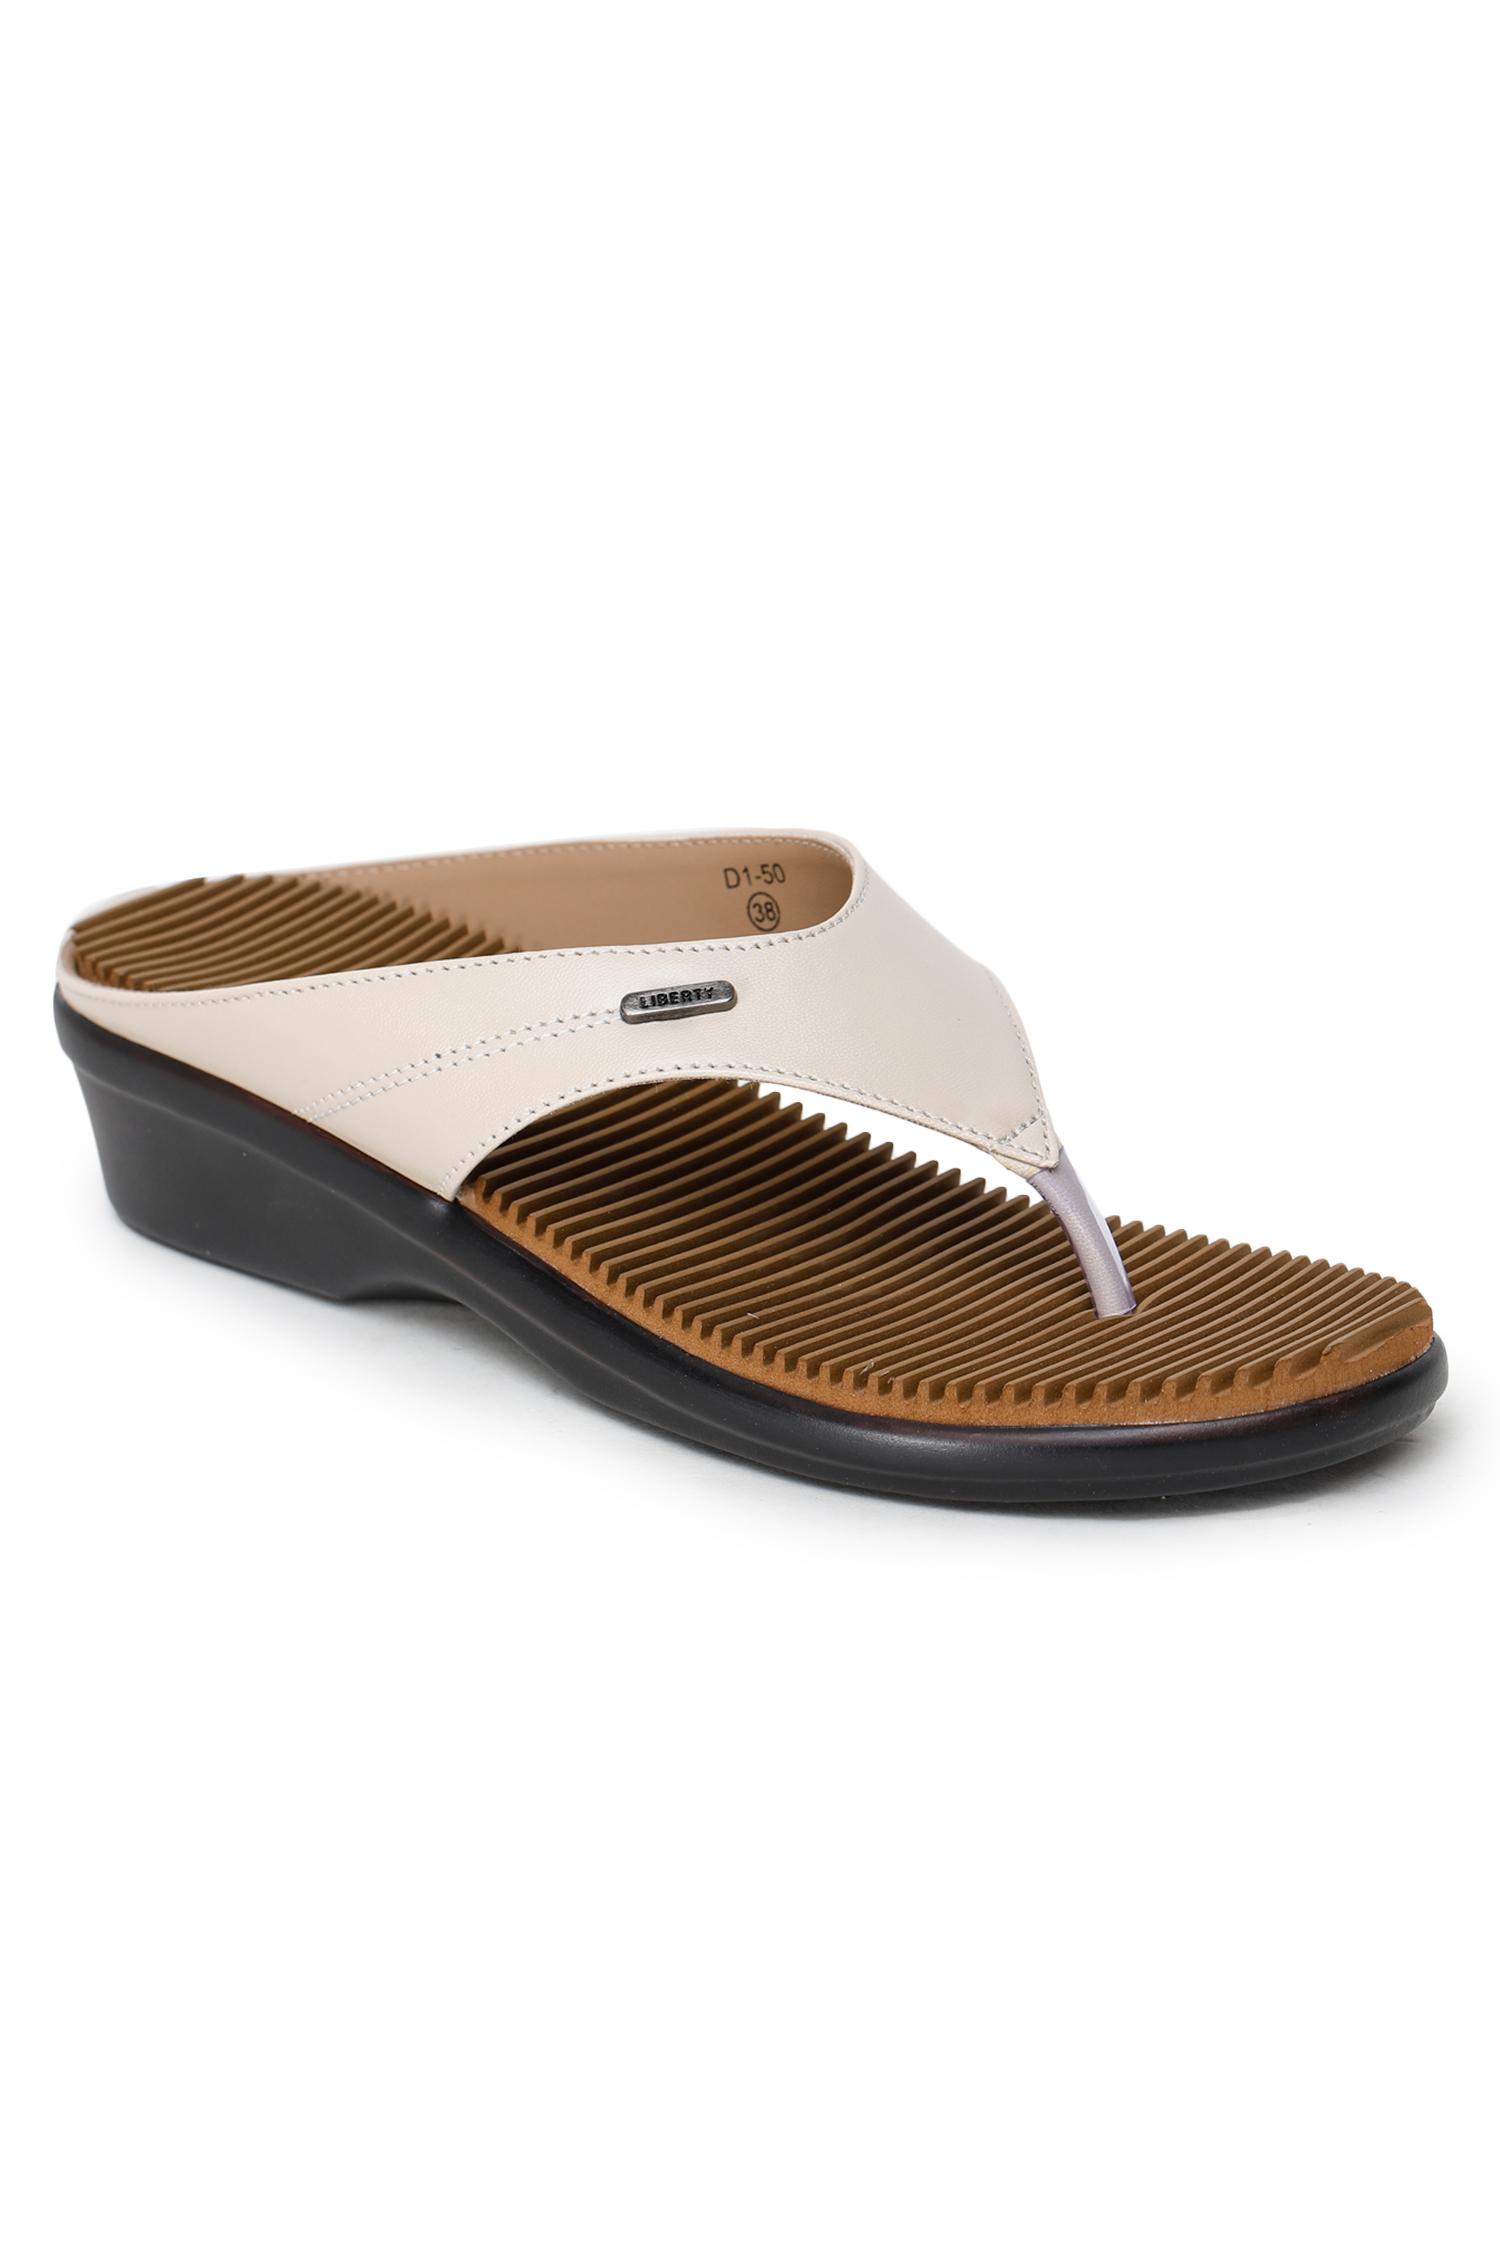 Liberty | Liberty SENORITA Sandals D1-50_BEIGE For - Women